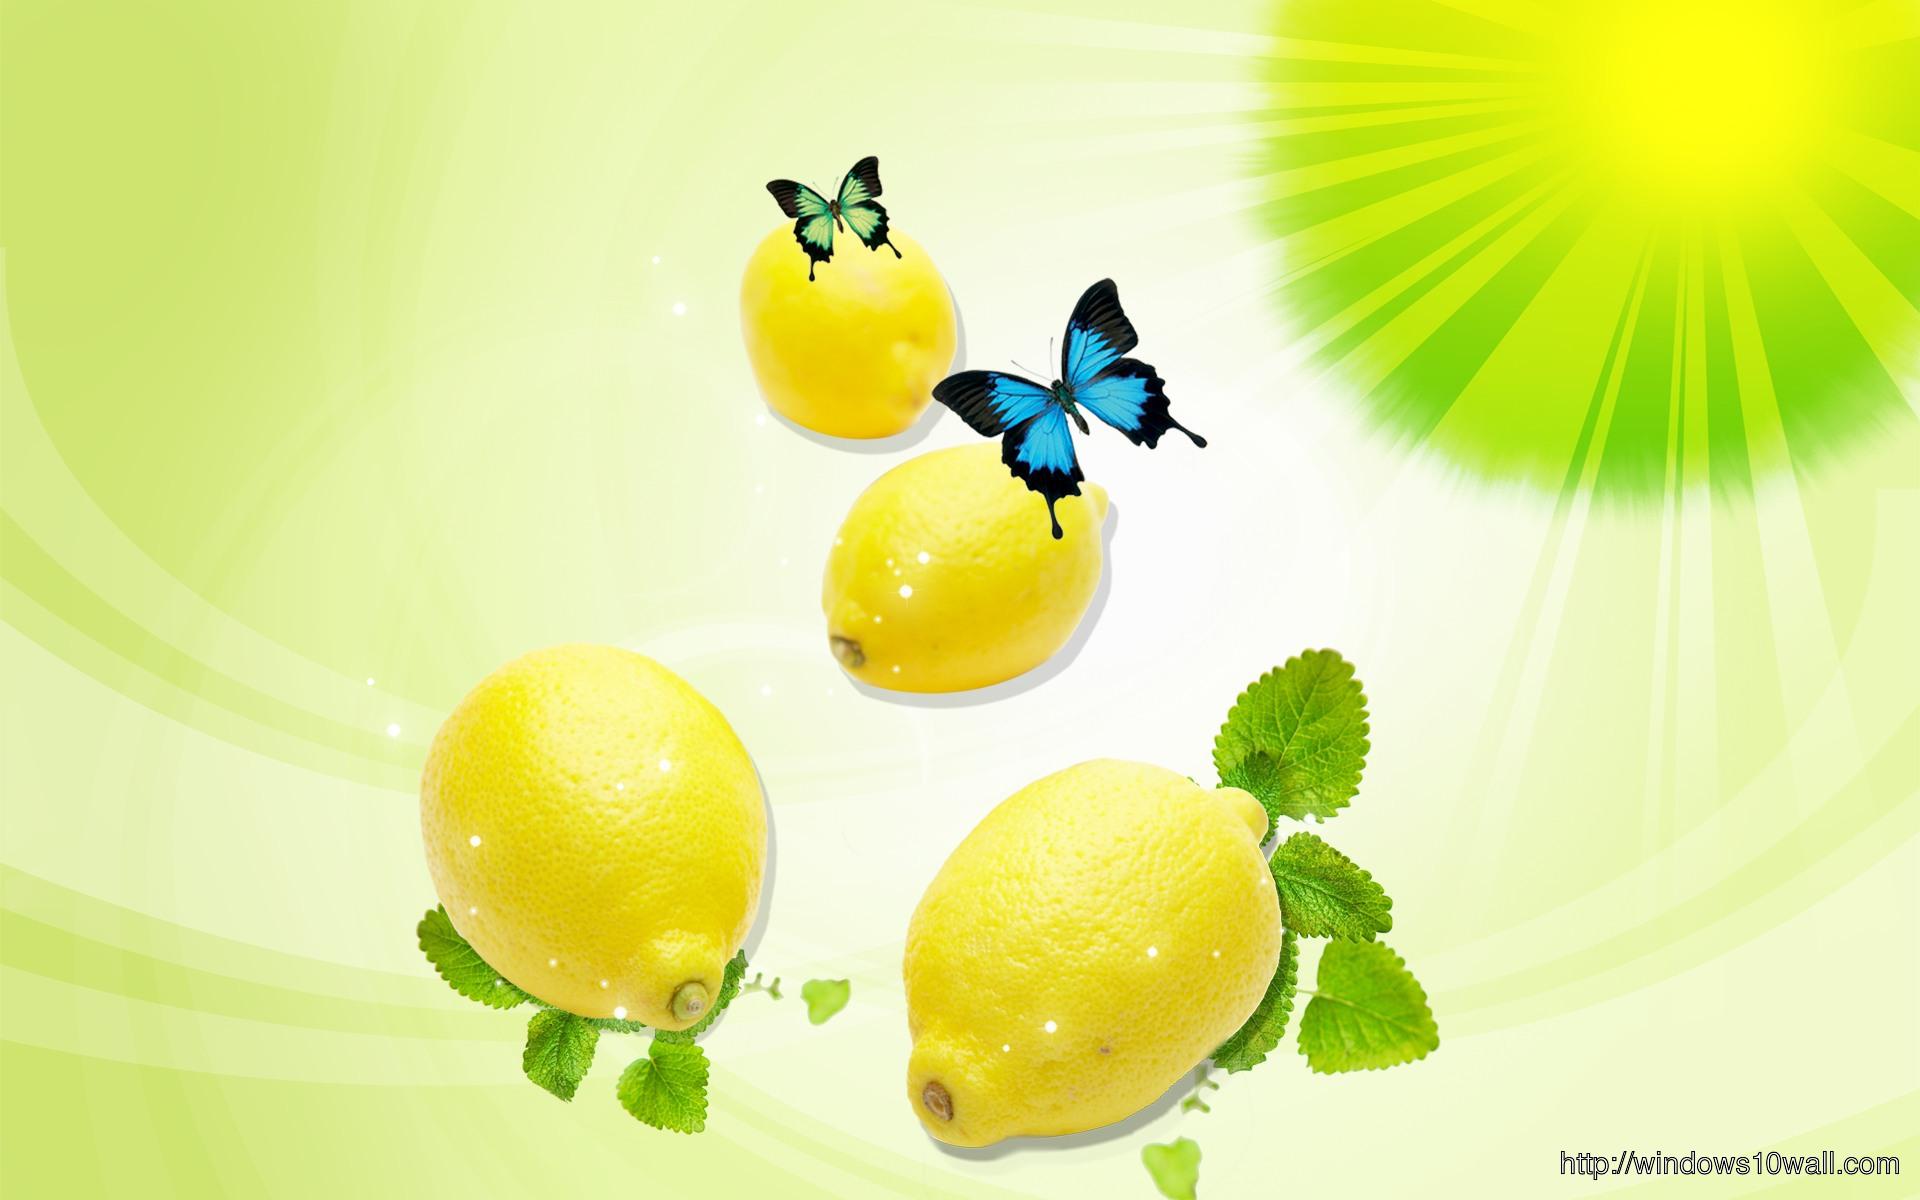 Digital Fruits Background Wallpaper